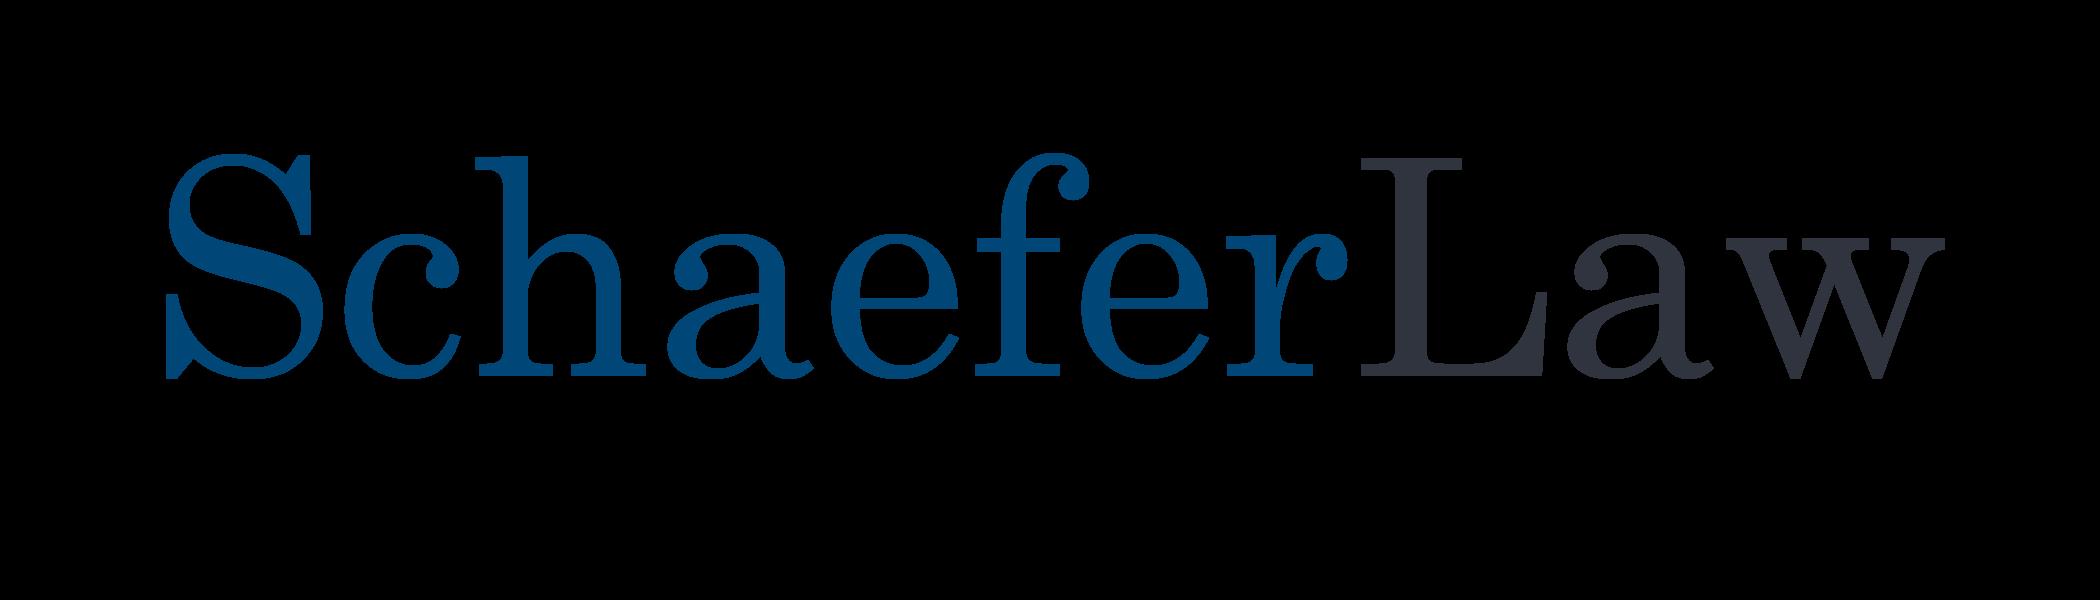 SchaeferLaw LLC